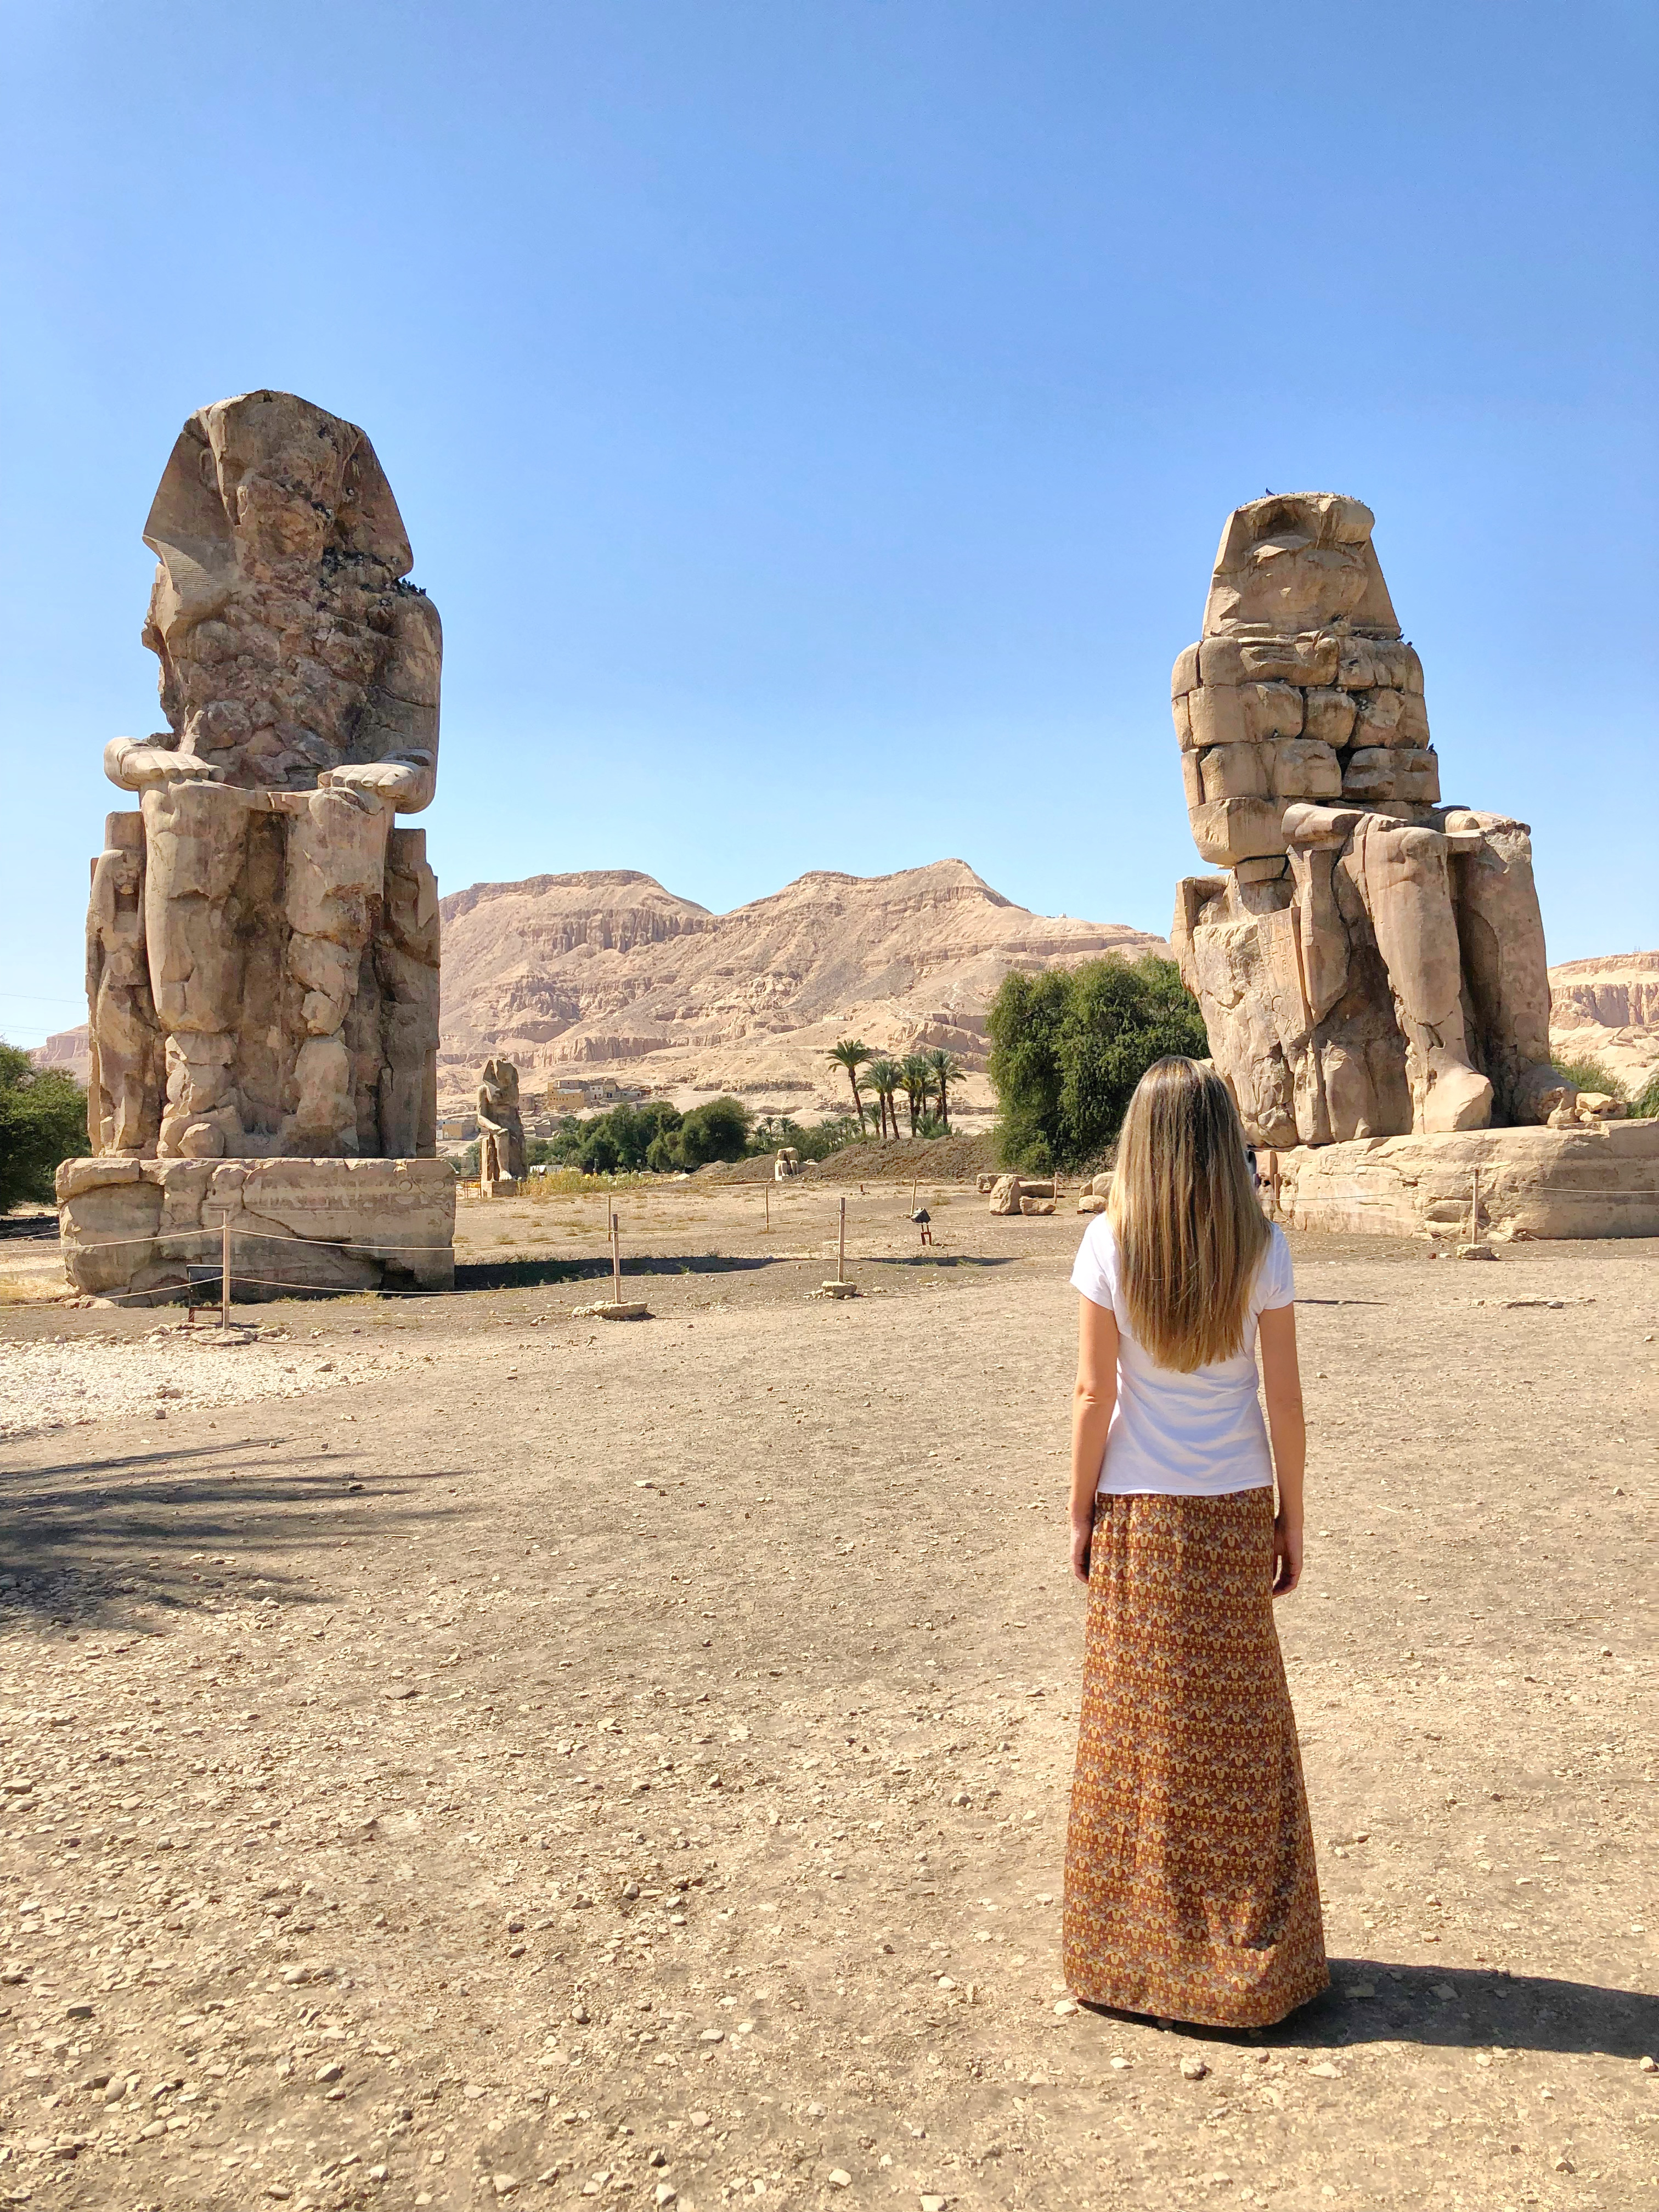 Colosos de Memnon 10 sitios imperdibles